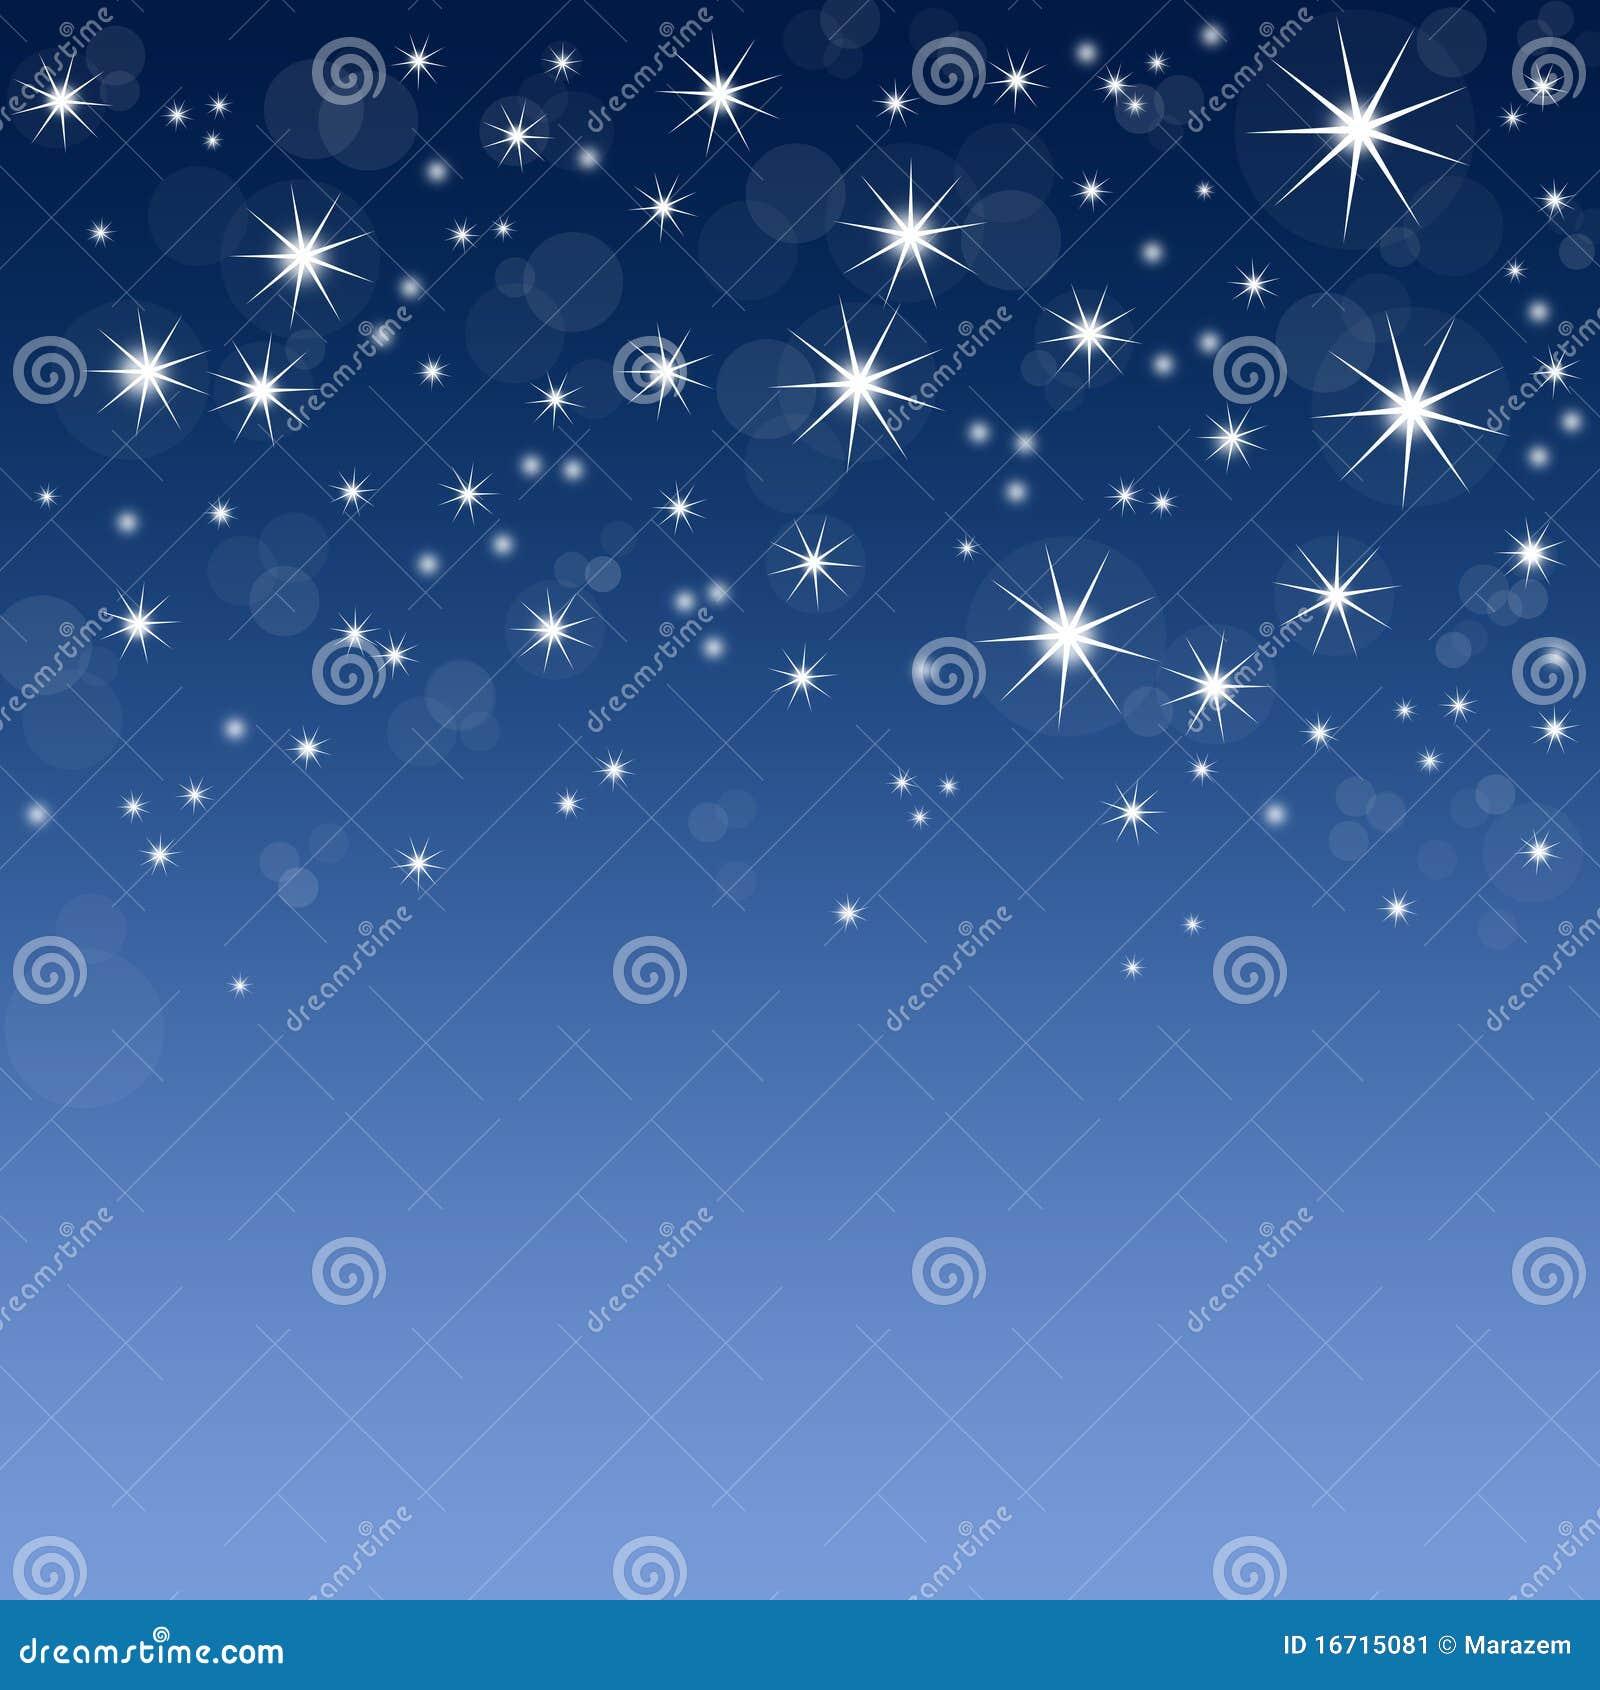 Fond bleu avec des étoiles